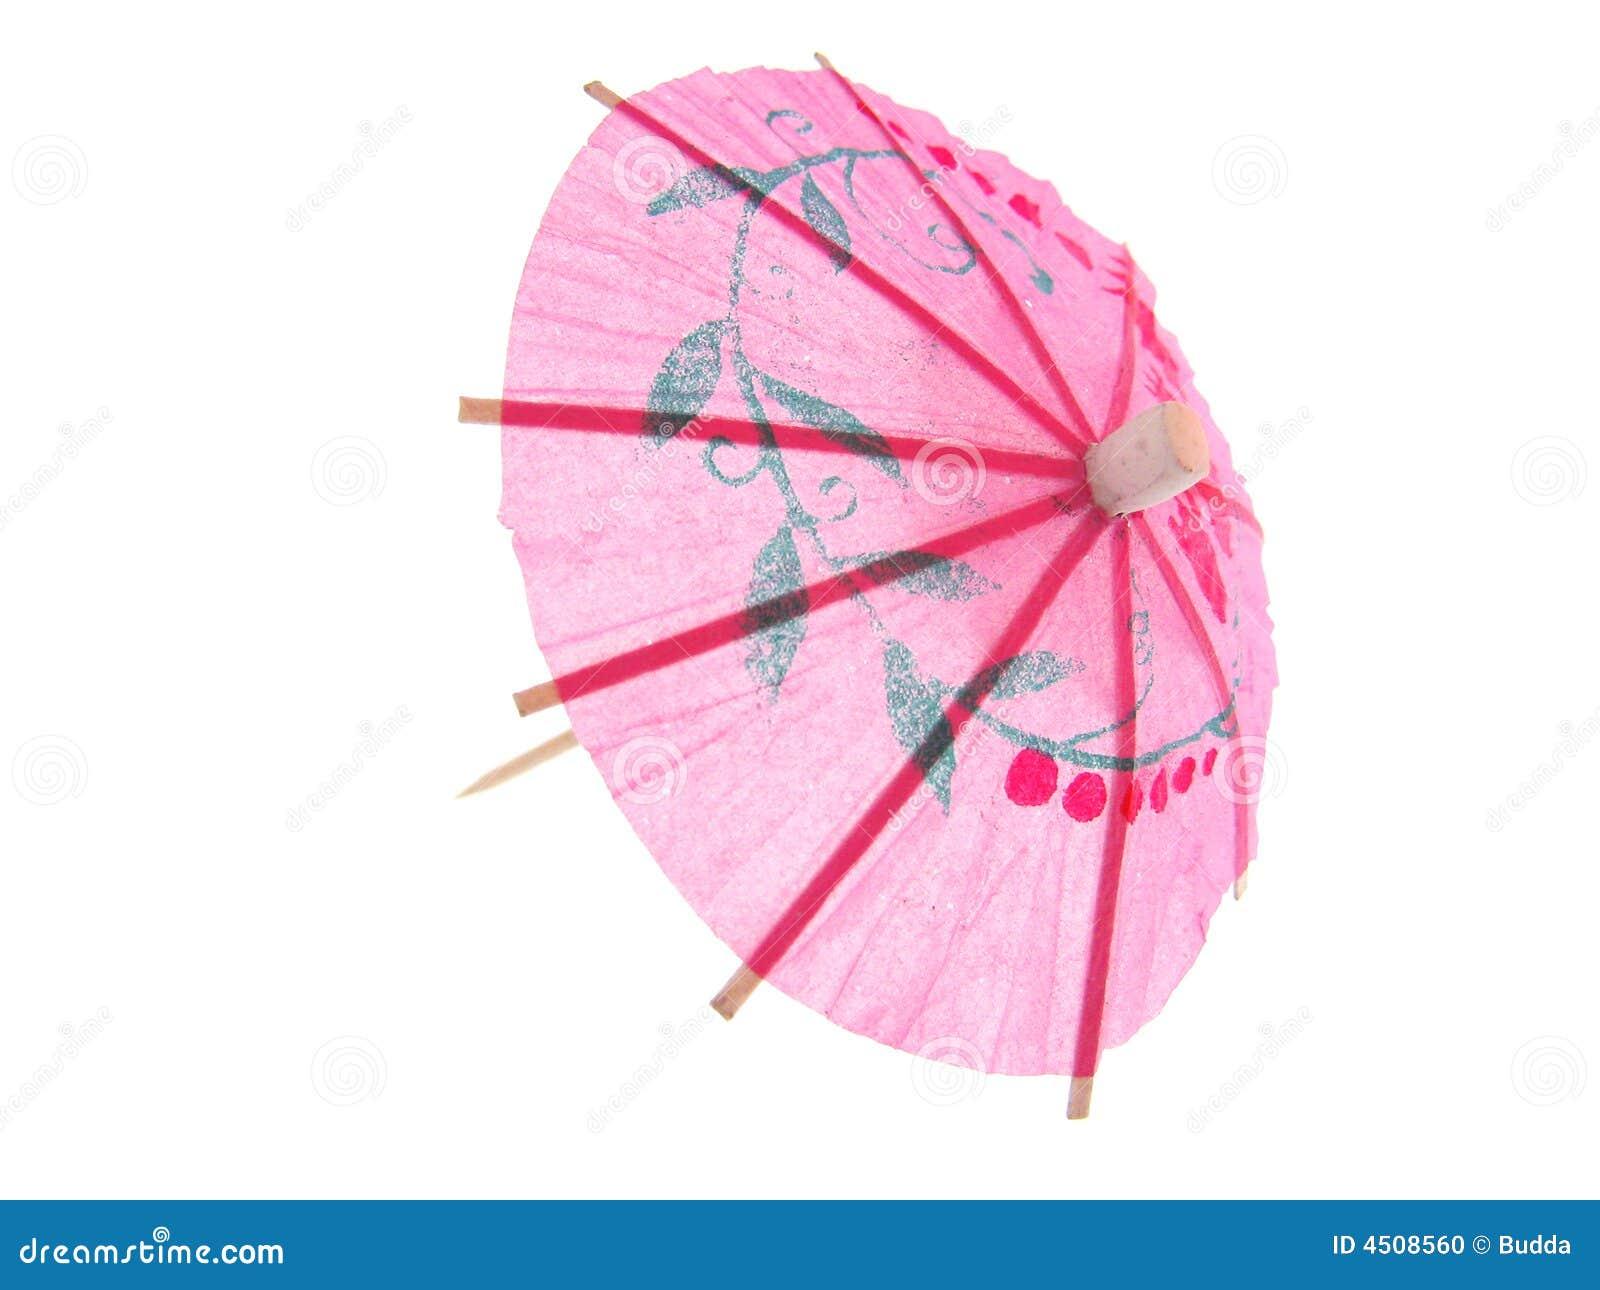 cocktail umbrella stock photo image 4508560